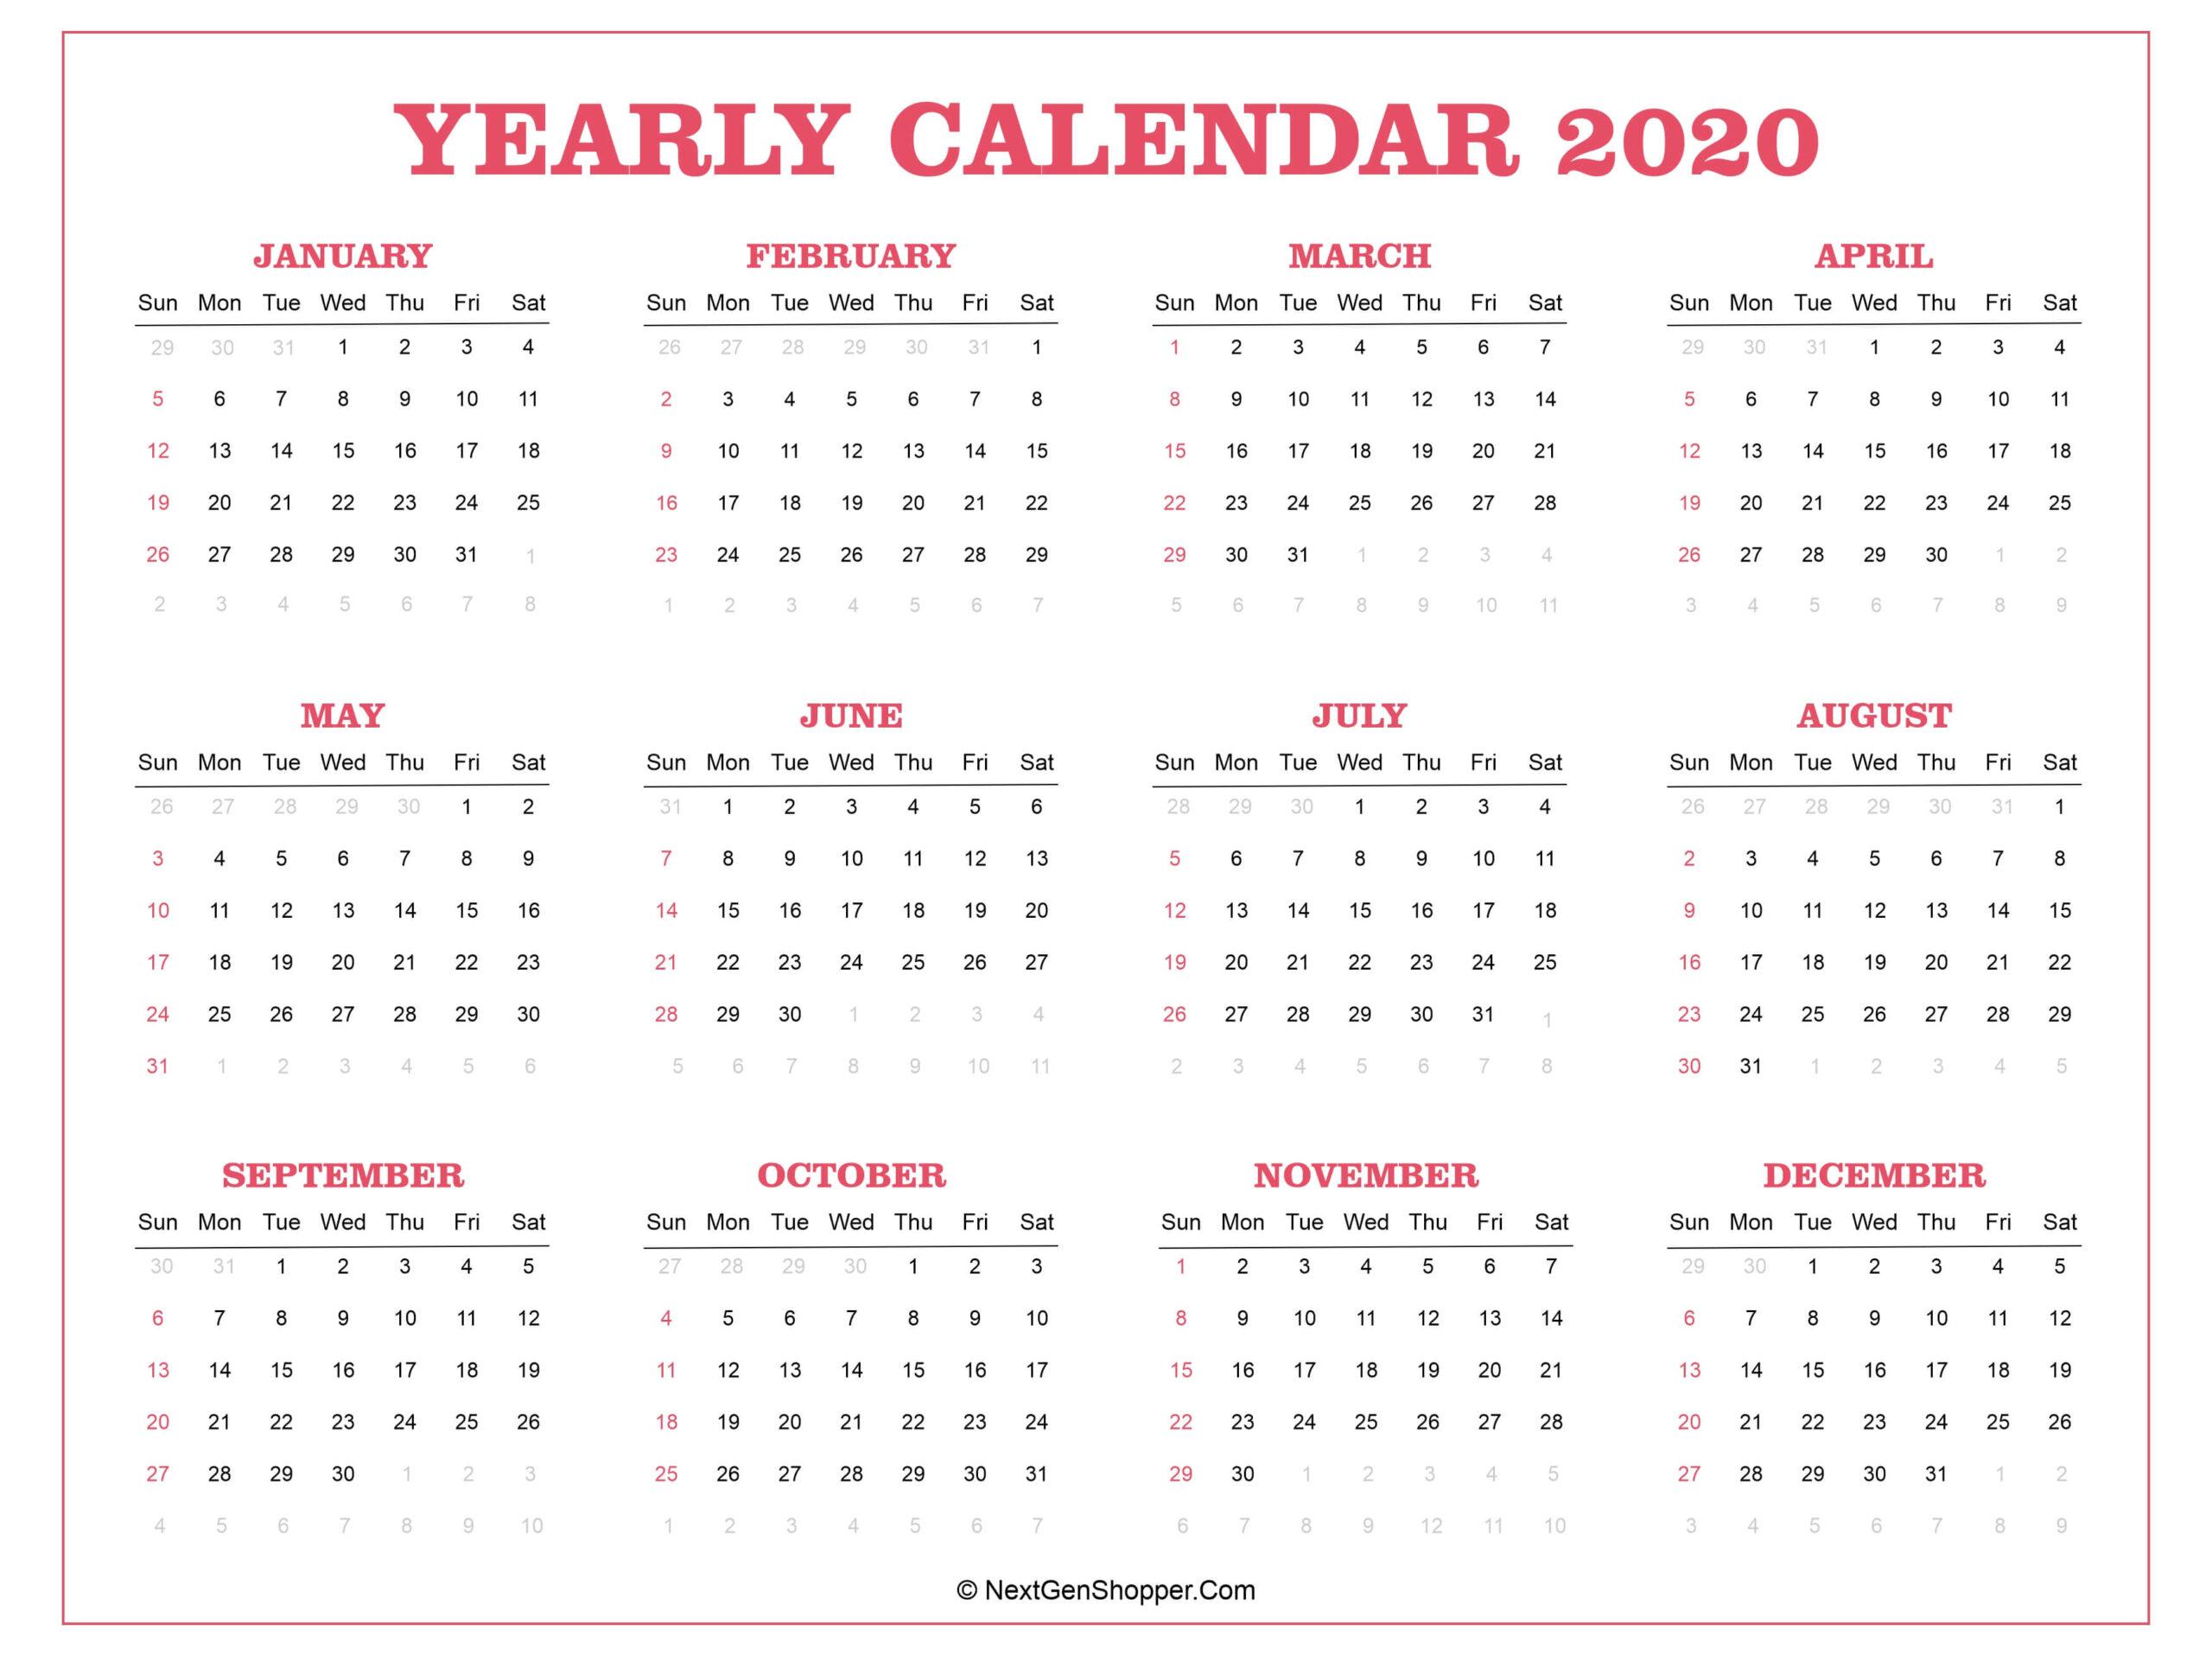 Printable 2020 Calendar Template - Task Management Guide for Federal Government Calendar Printable